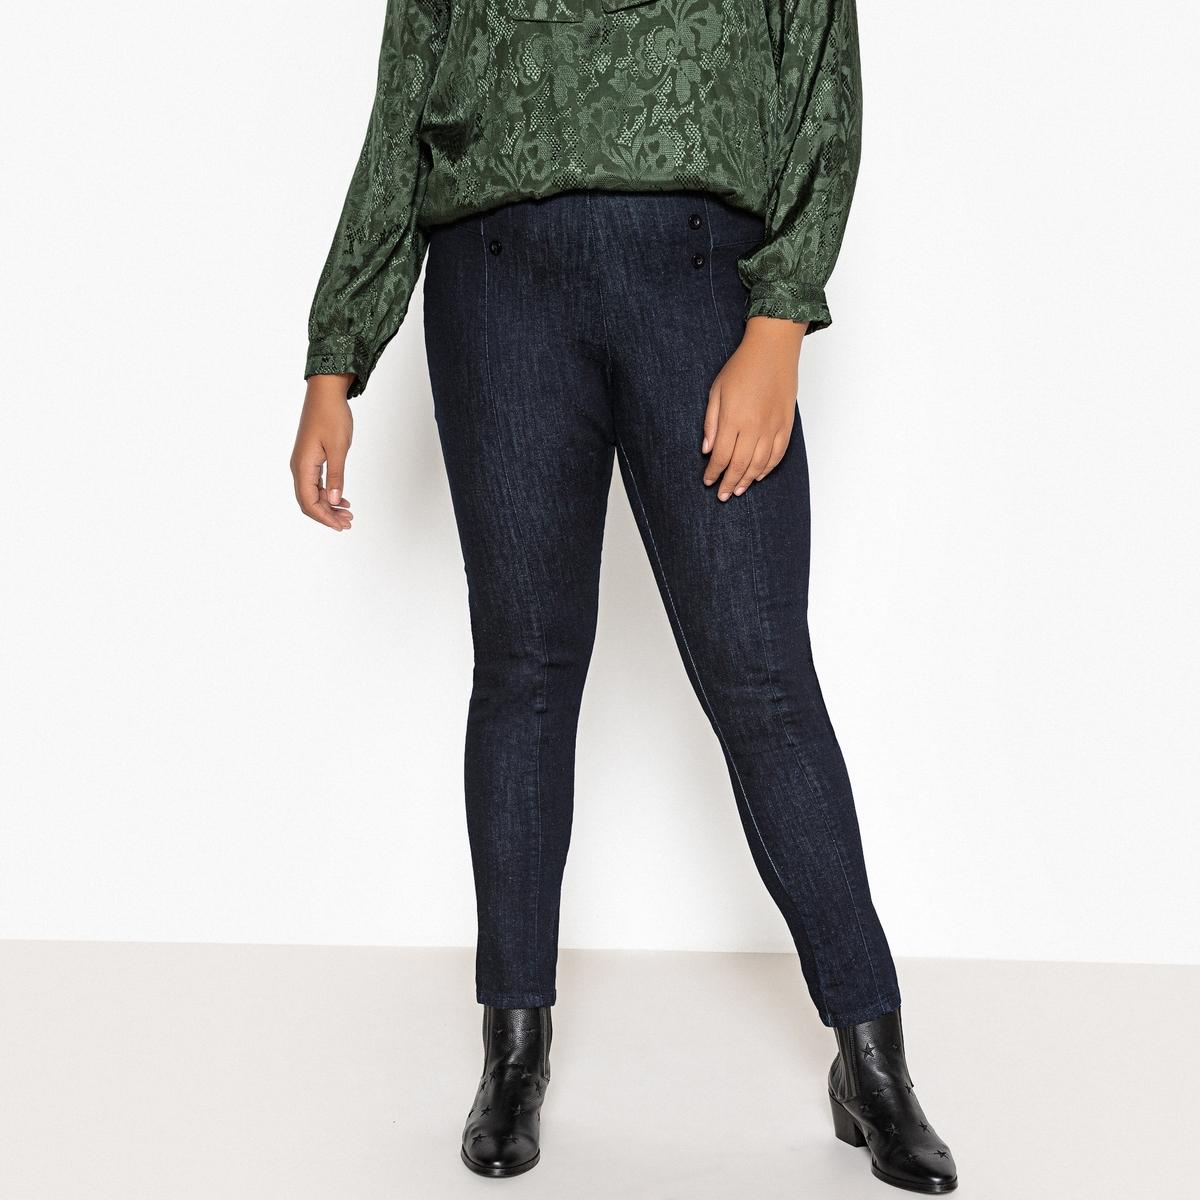 Jeans slim, cintura subida